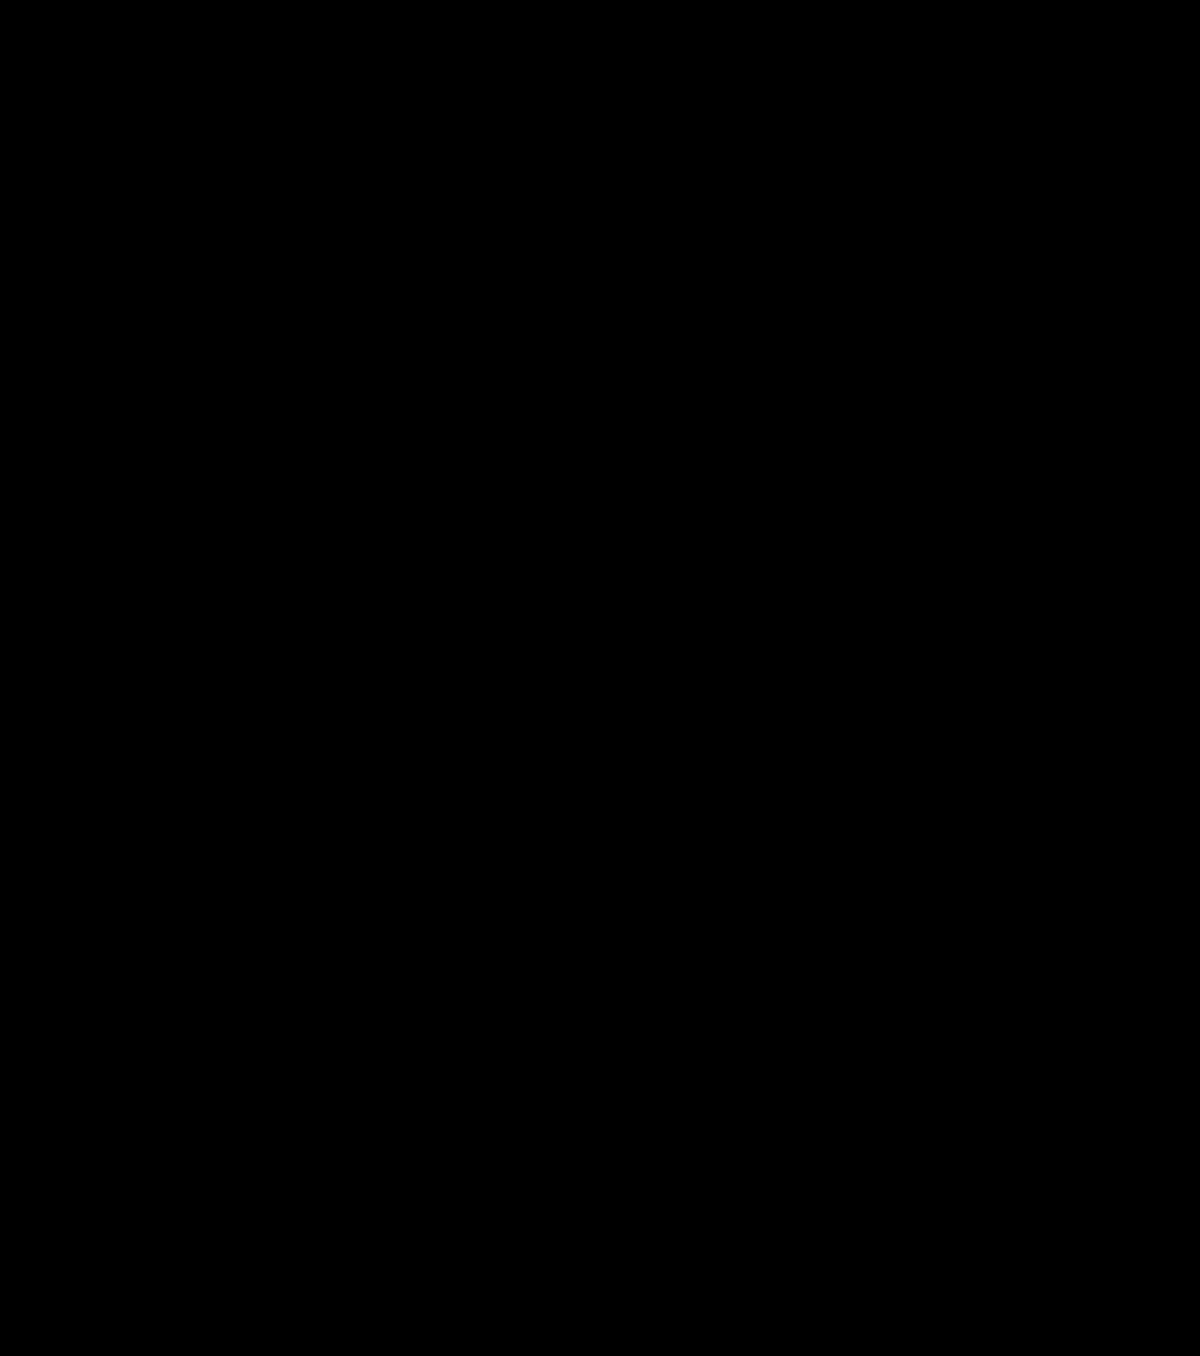 Capco Competitors, Revenue and Employees - Owler Company Profile